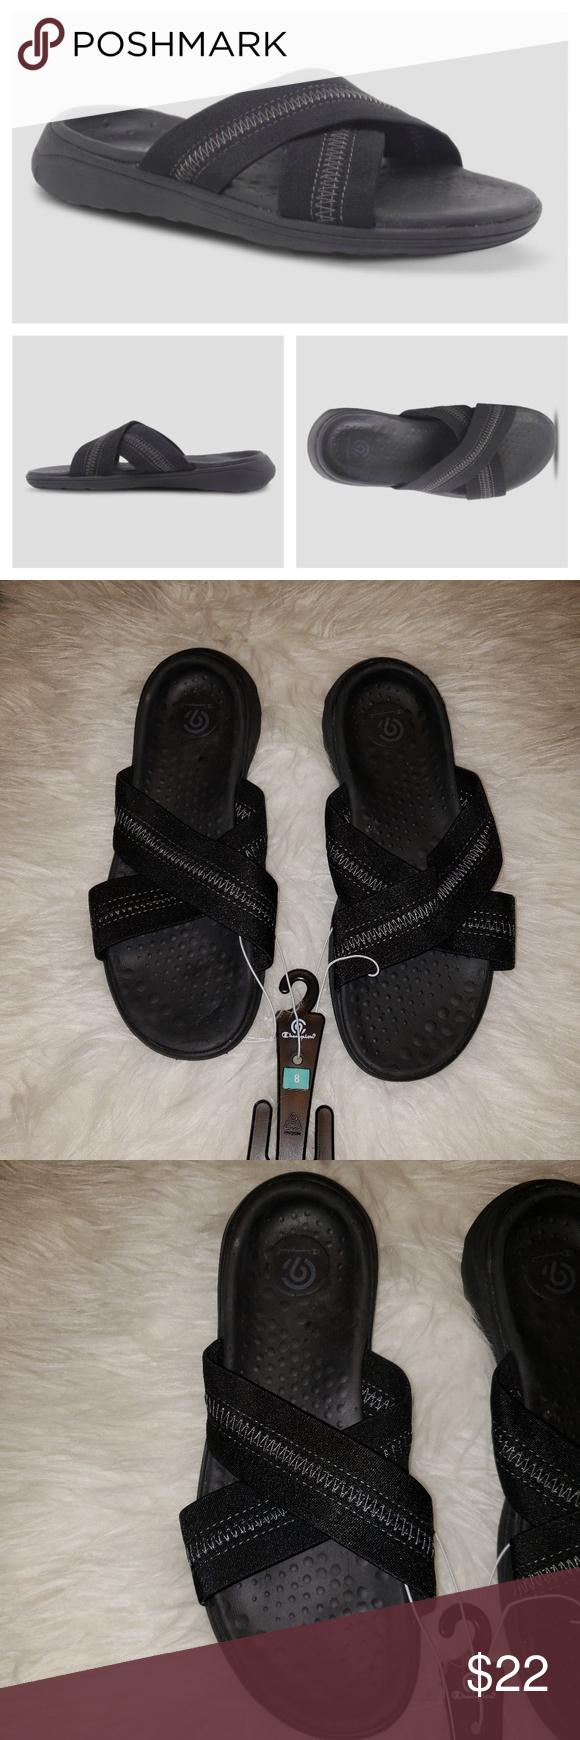 480aaf30f716 NWT Champion Women s Deana Slide Sandal EVA insoles offer lightweight  comfort Open-toe sandals are